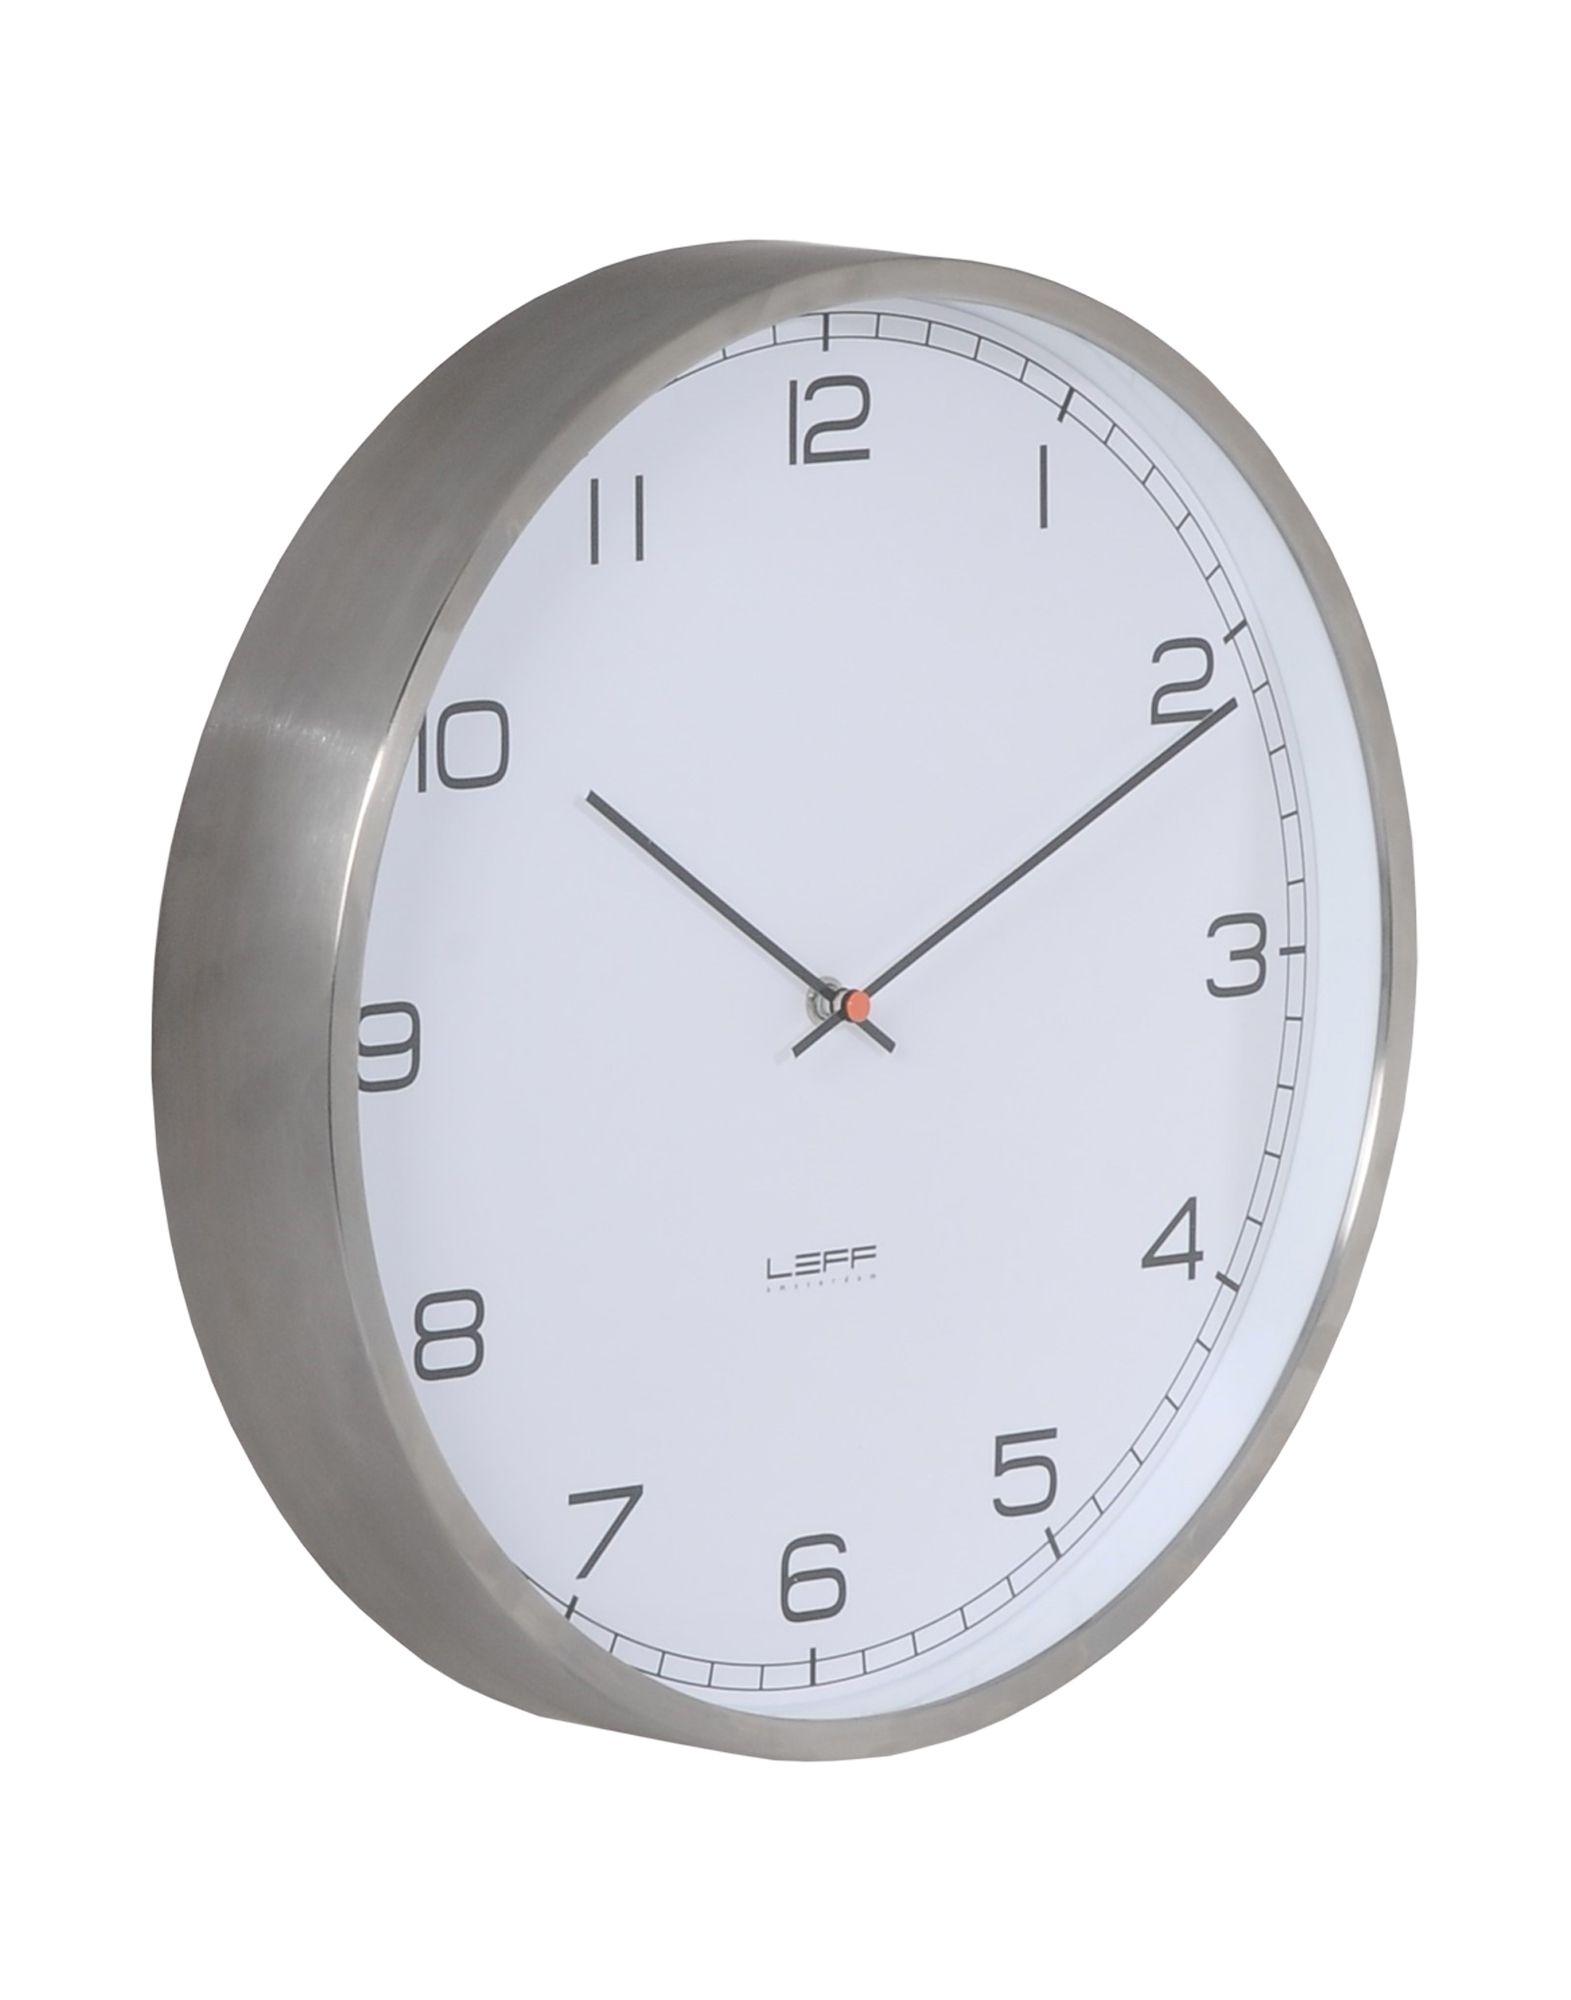 LEFF Amsterdam Настенные часы zara larsson amsterdam